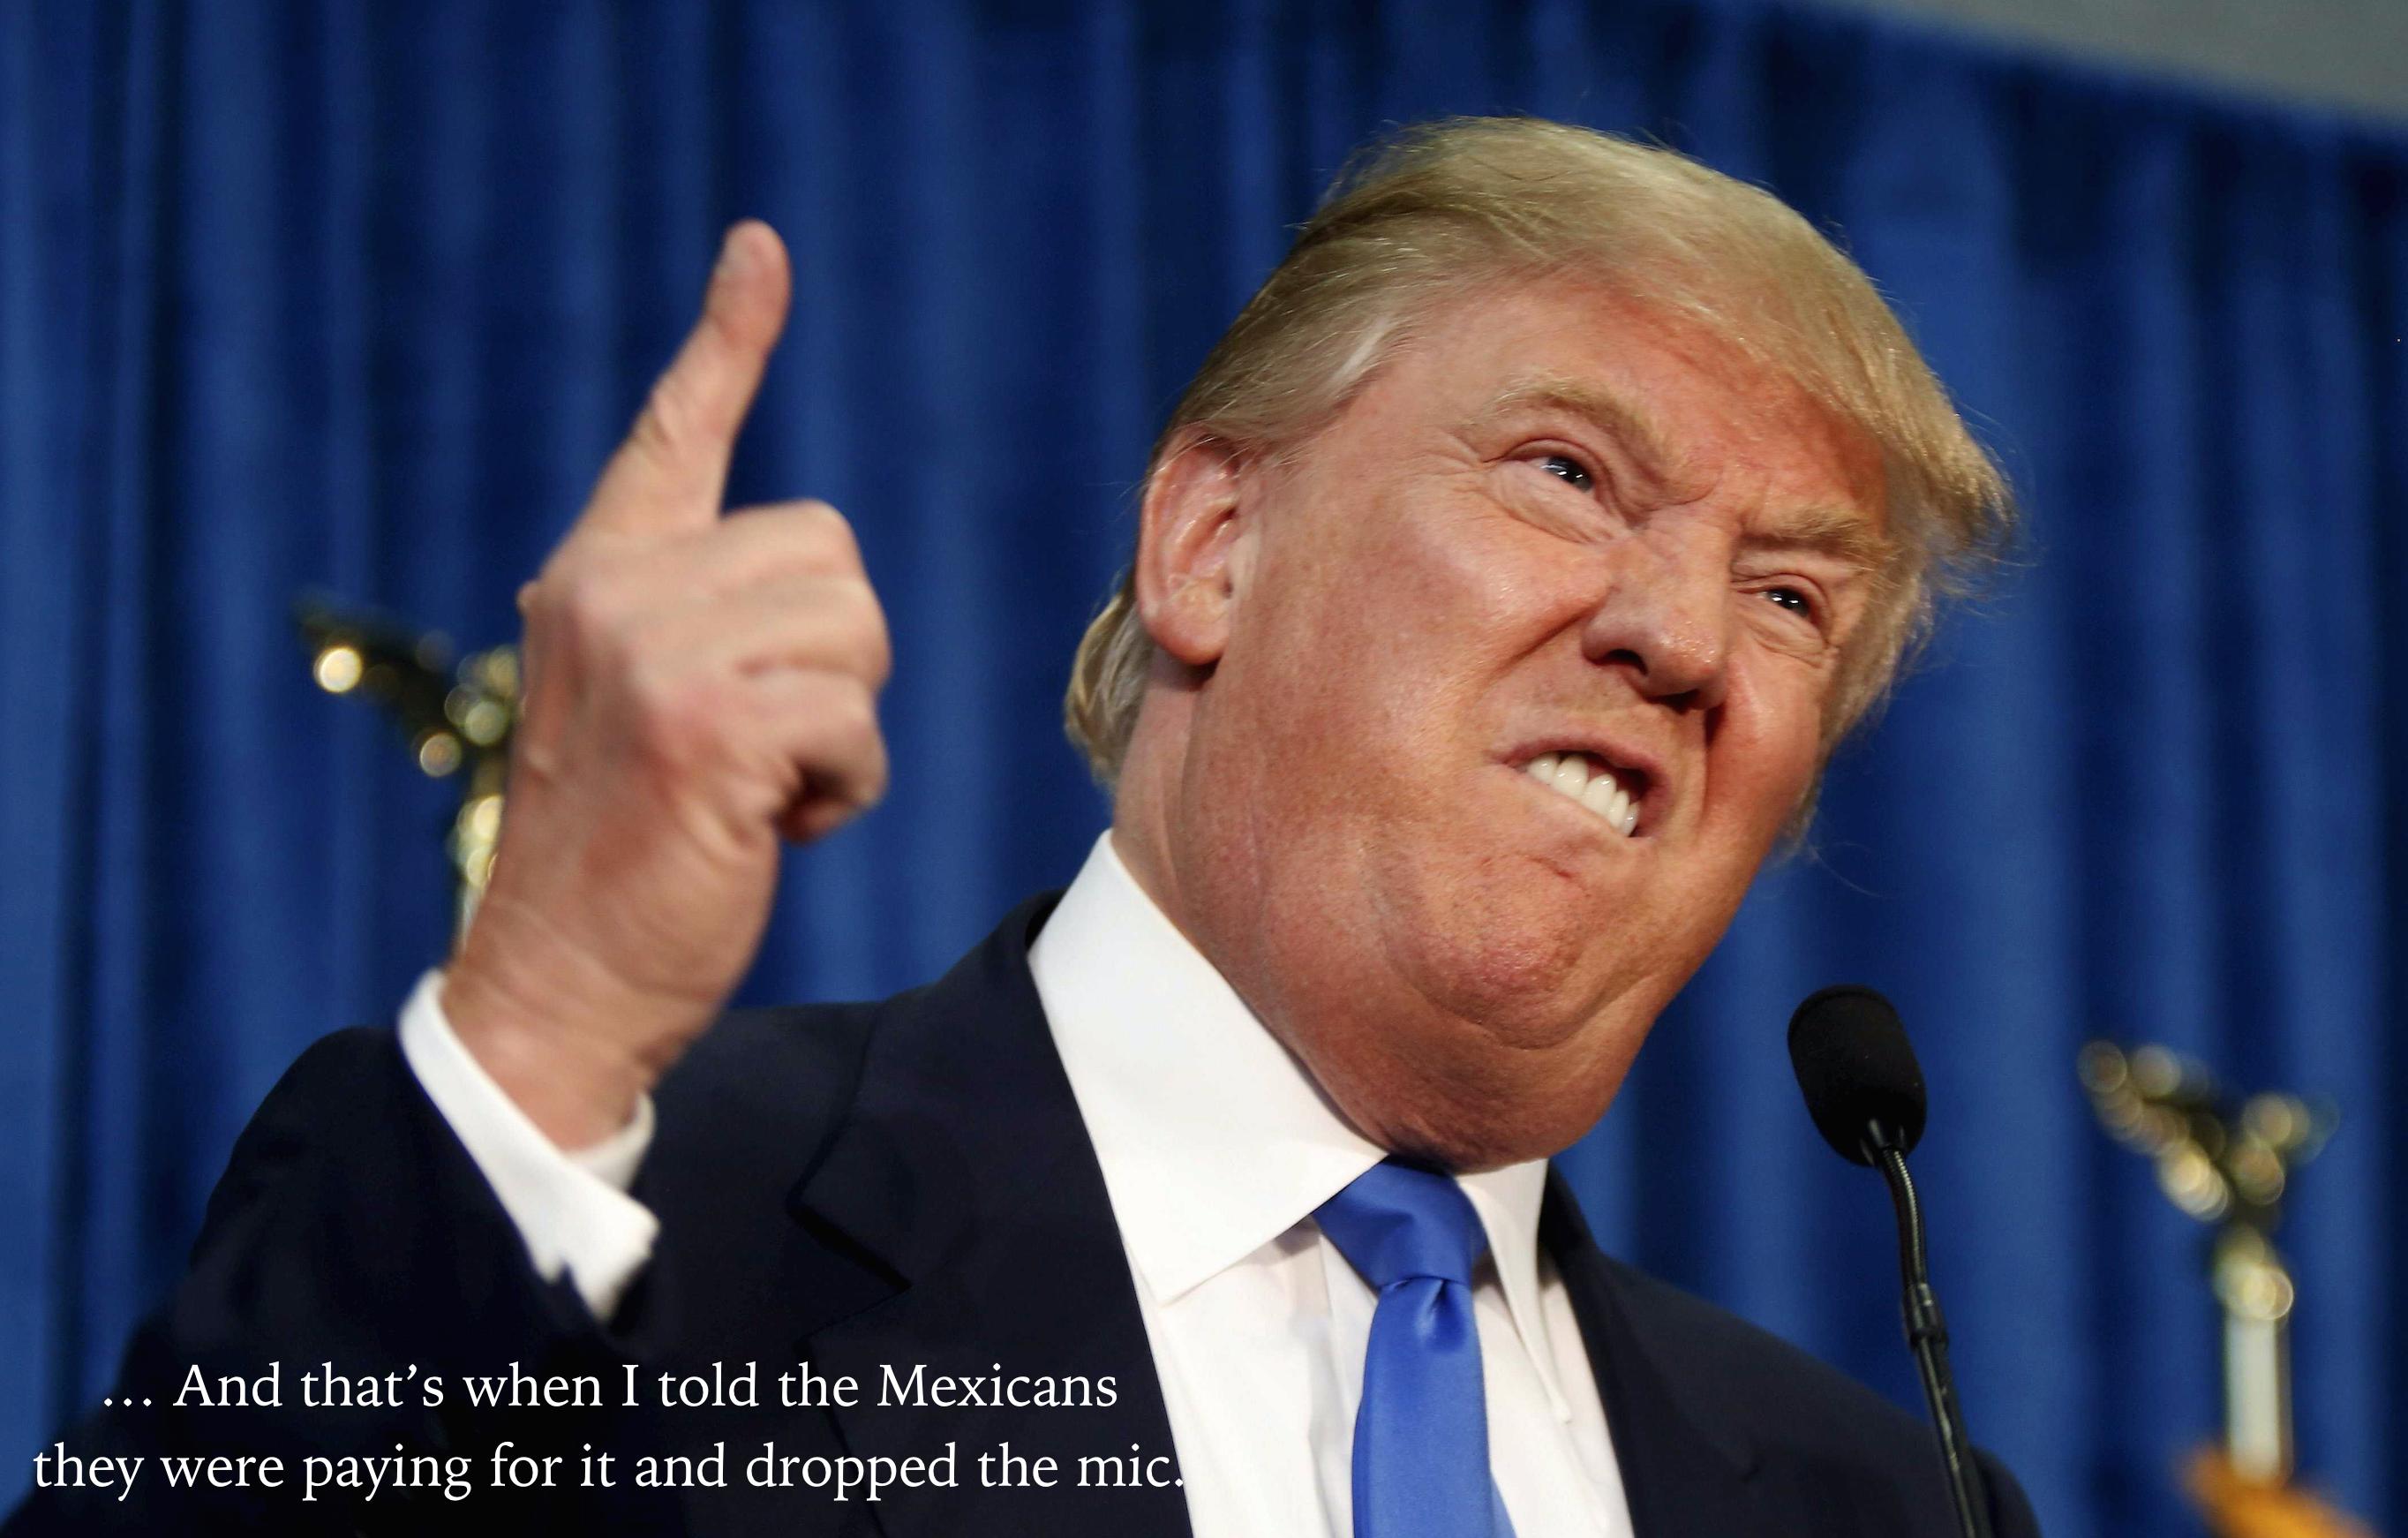 donald trump finger wagging meme